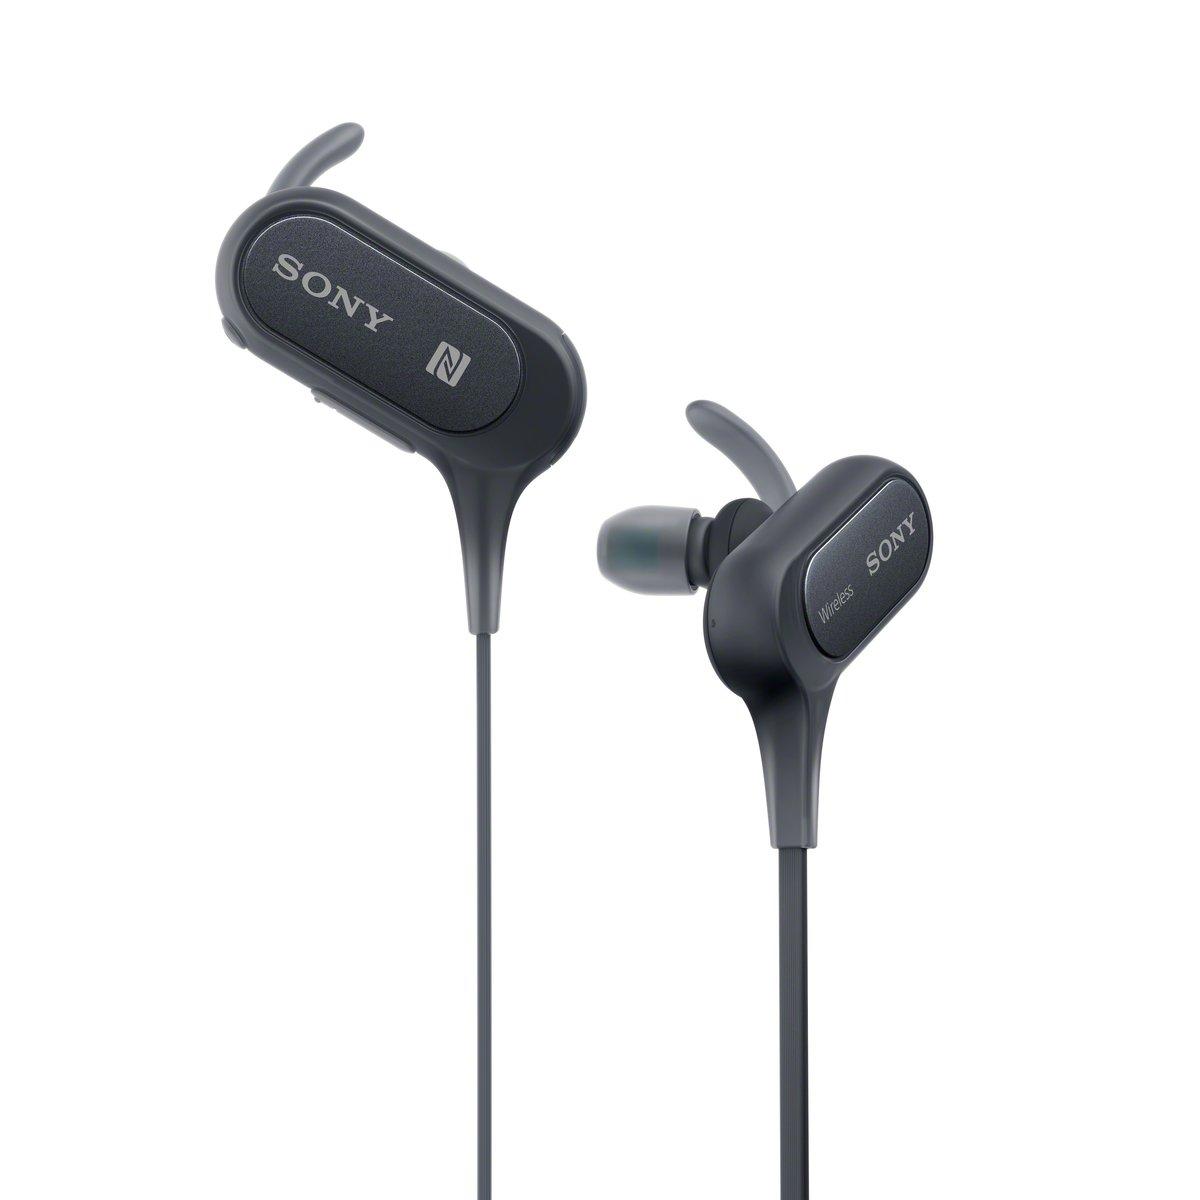 Sony Mdrxb50bs Clip On Bt Wireless Headphones Behind The Army Handsfree Earphone Iron Bass 2 Biru Neck Electronics Shop Exchange